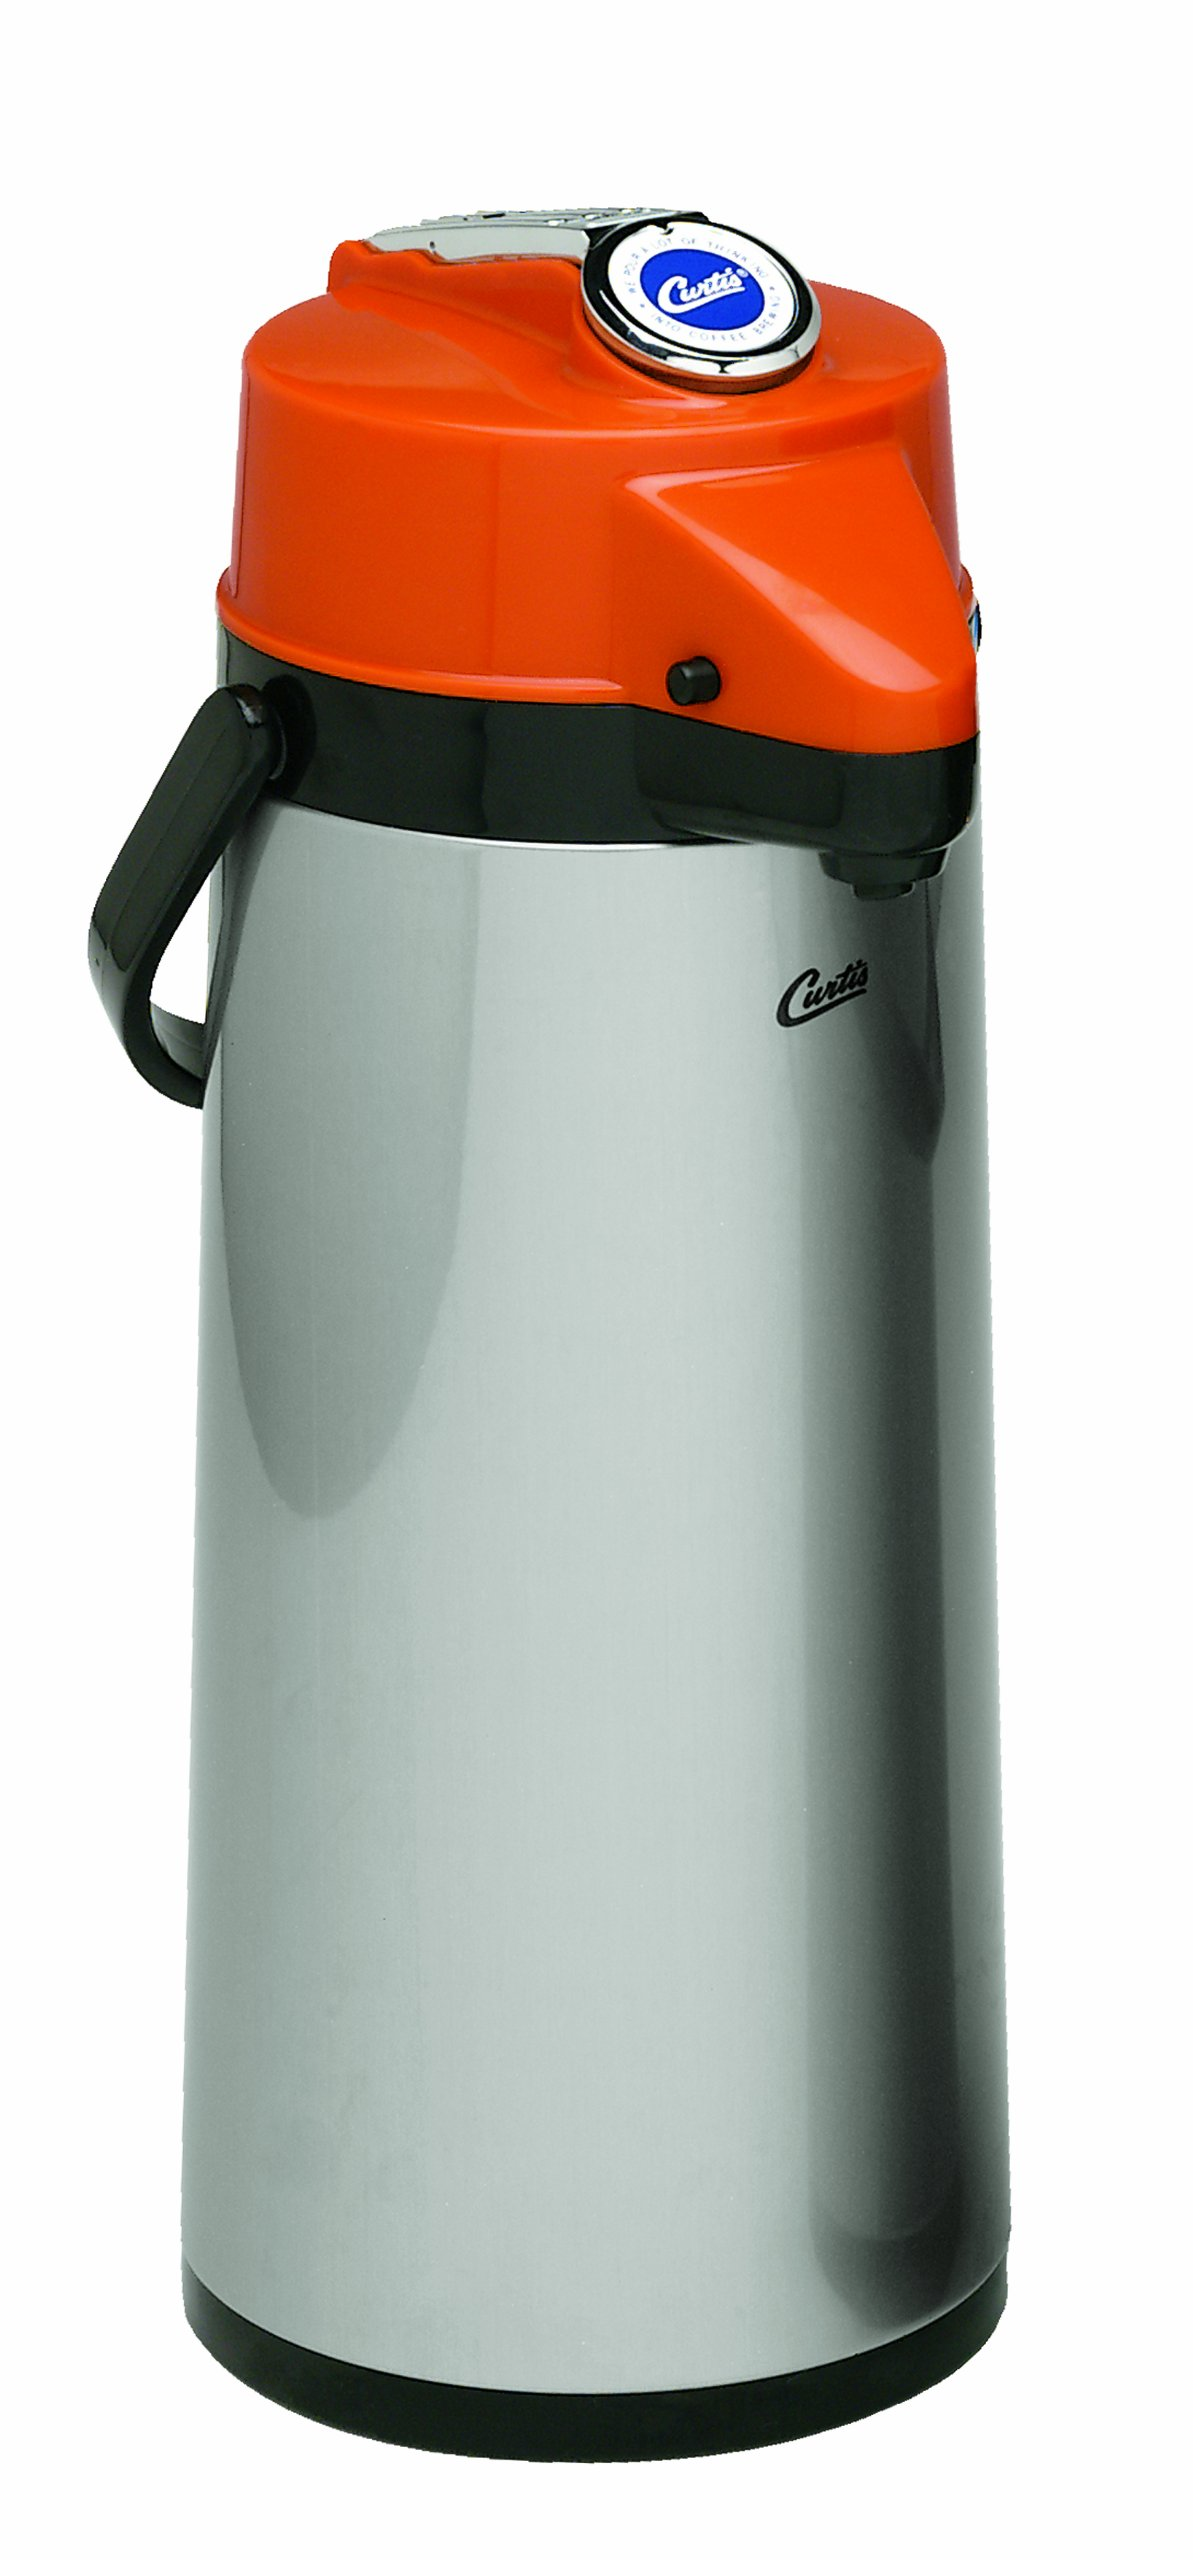 Wilbur Curtis Thermal Dispenser Air Pot, 2.2L S.S. Body Glass Liner Lever Pump, Decaf - Commercial Airpot Pourpot Beverage Dispenser - TLXA2201G000D (Each) by Wilbur Curtis (Image #1)